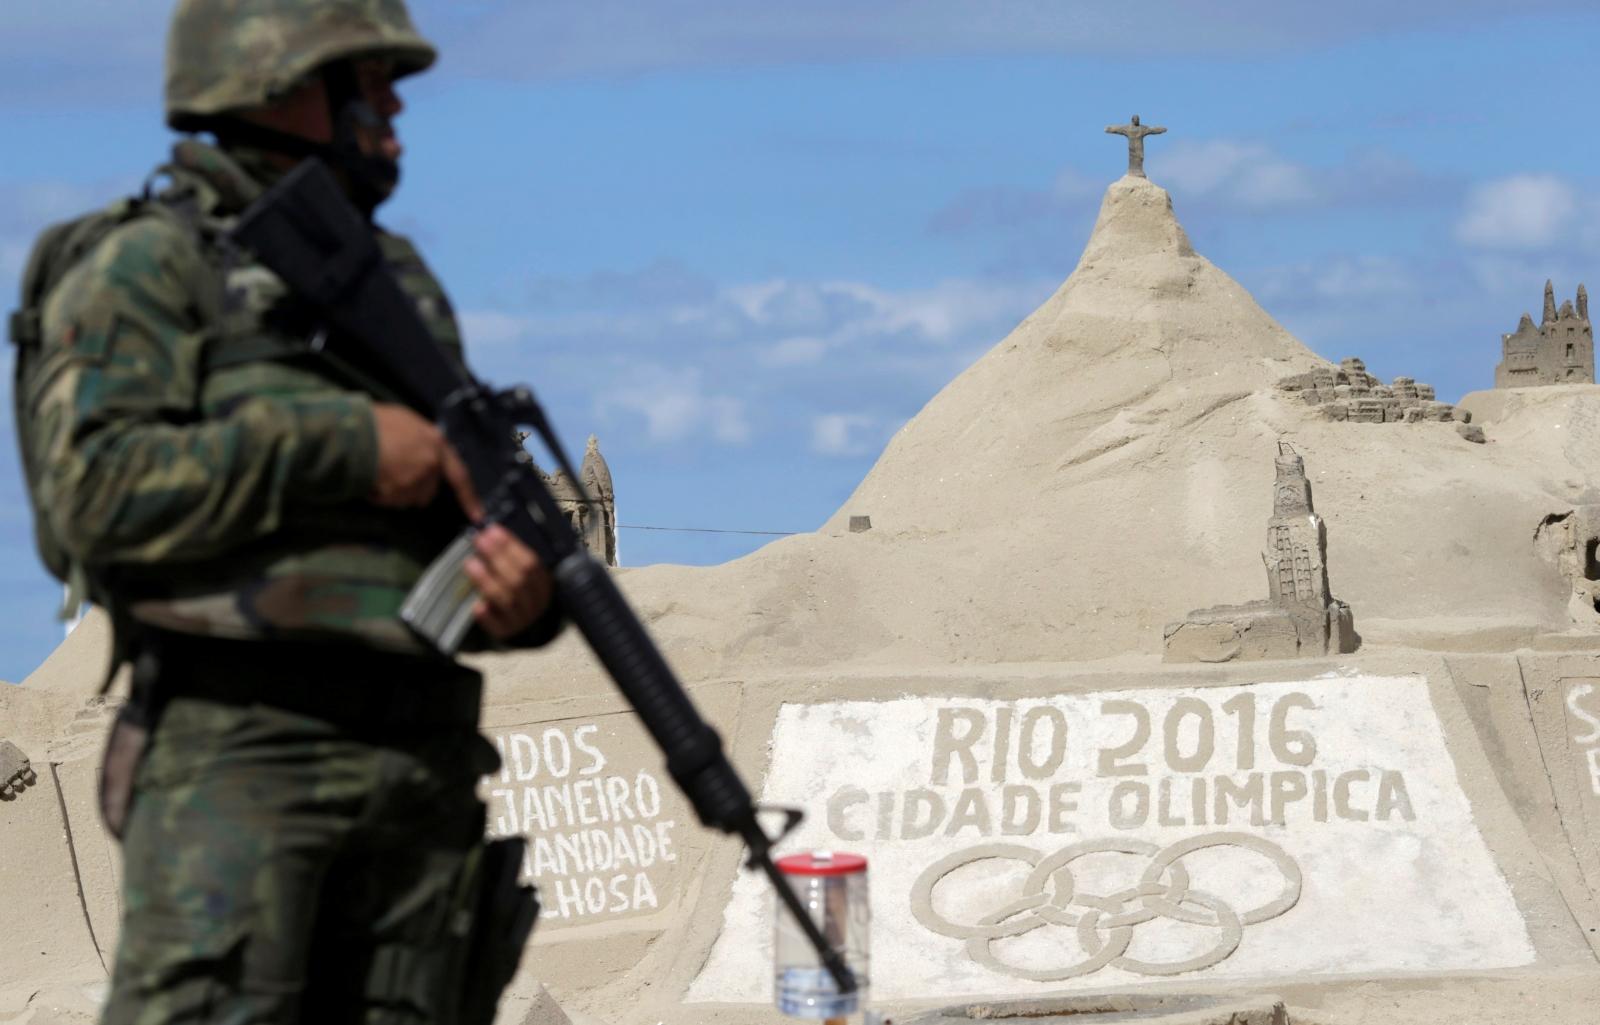 Rio de Janeiro Olympics Isis threat